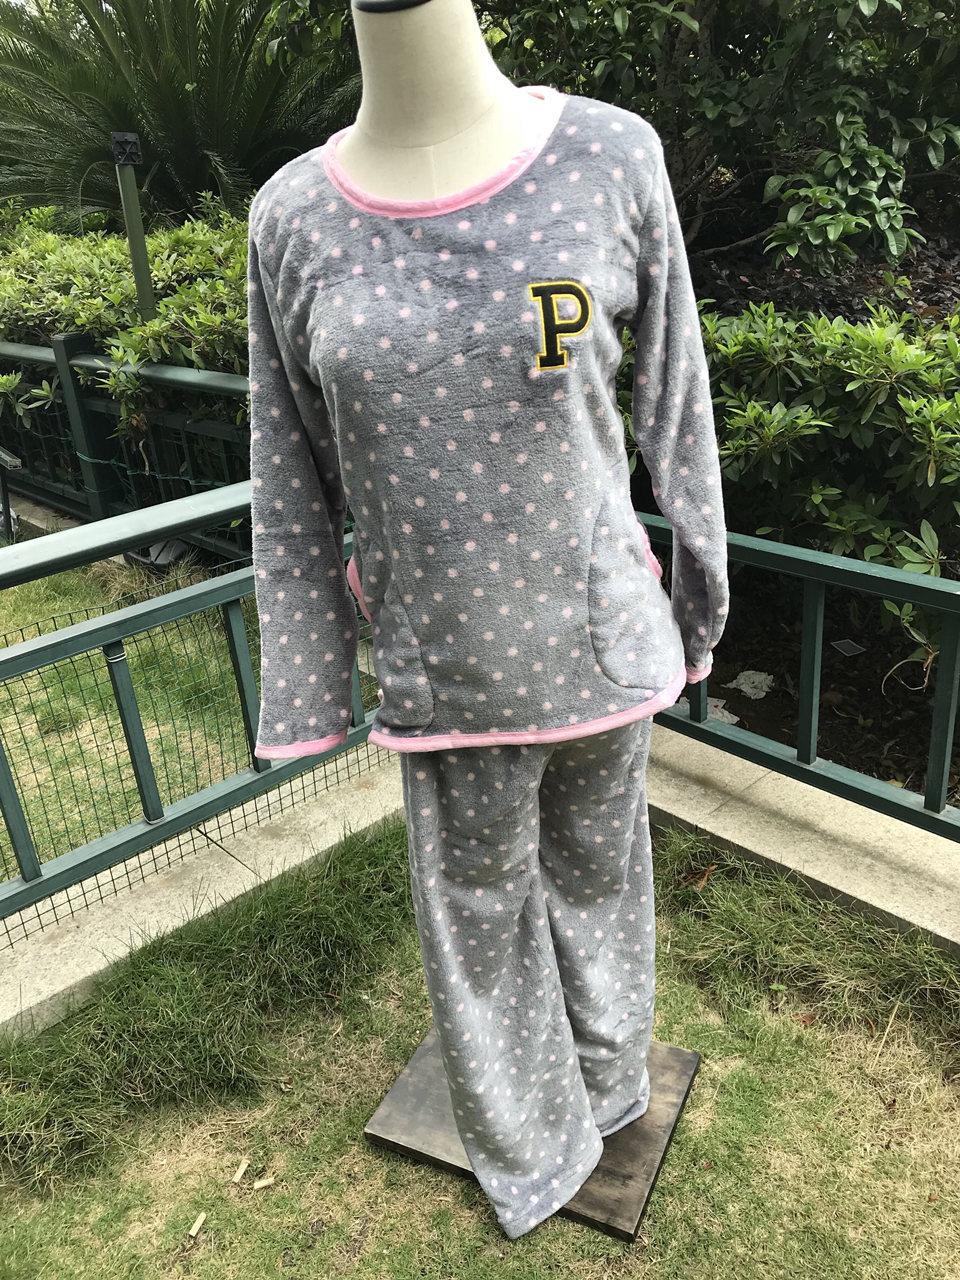 7a24f46692 Invierno Pijamas Mujer completa poliéster pantalones dama de dos ...